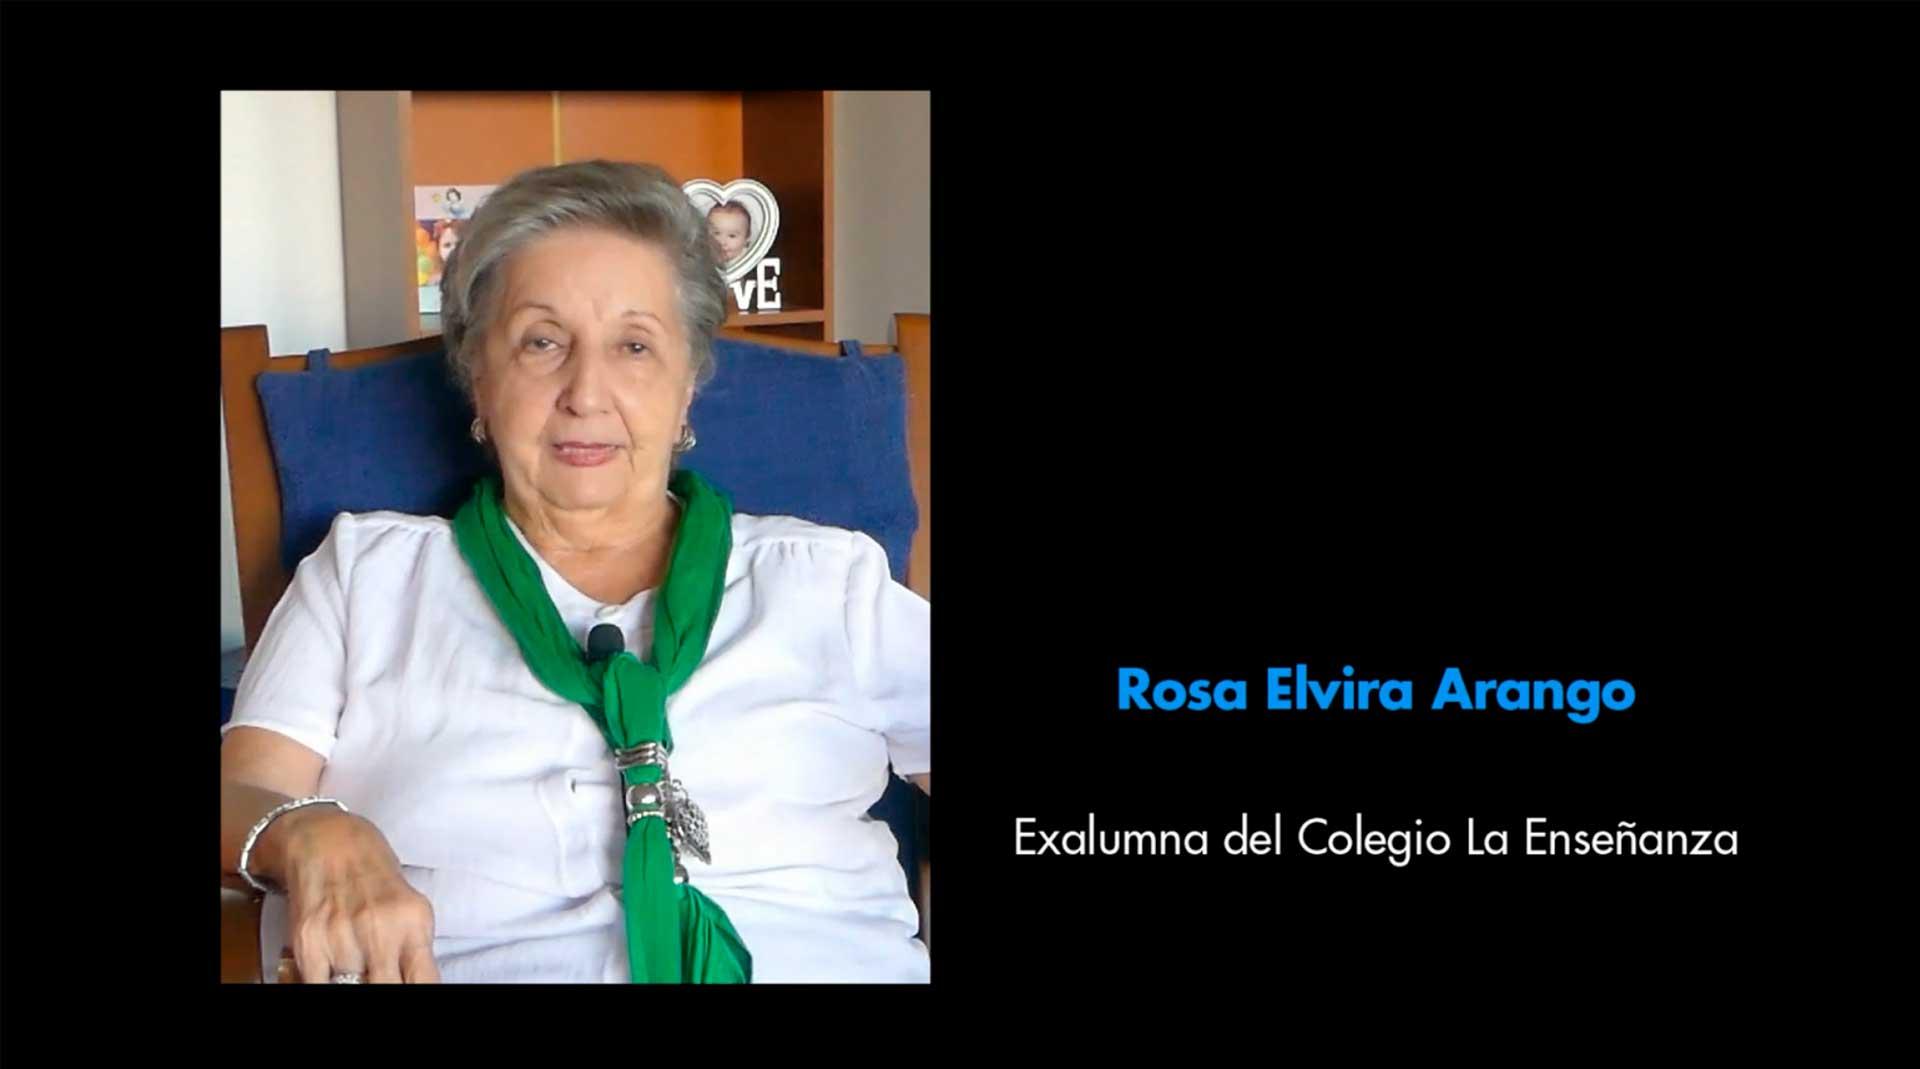 Rosa-Elvira-1920